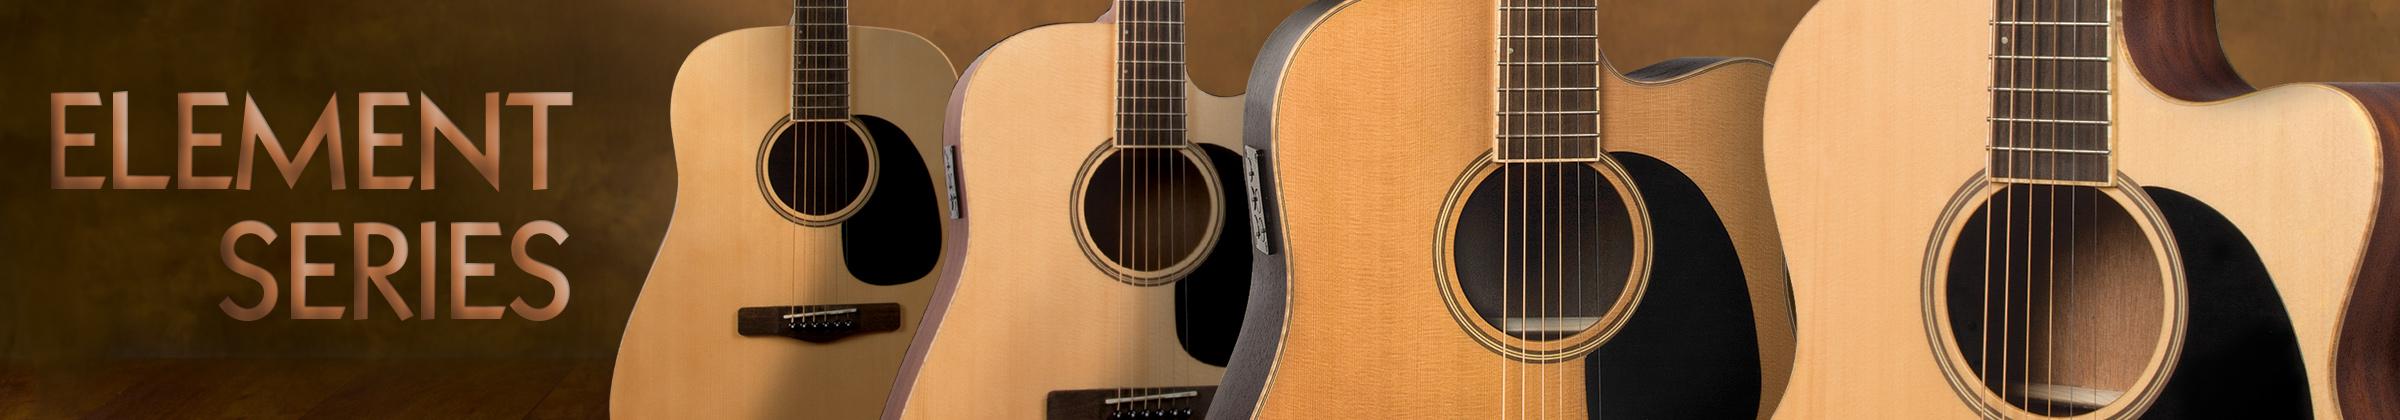 Mitchell Guitars Element Series